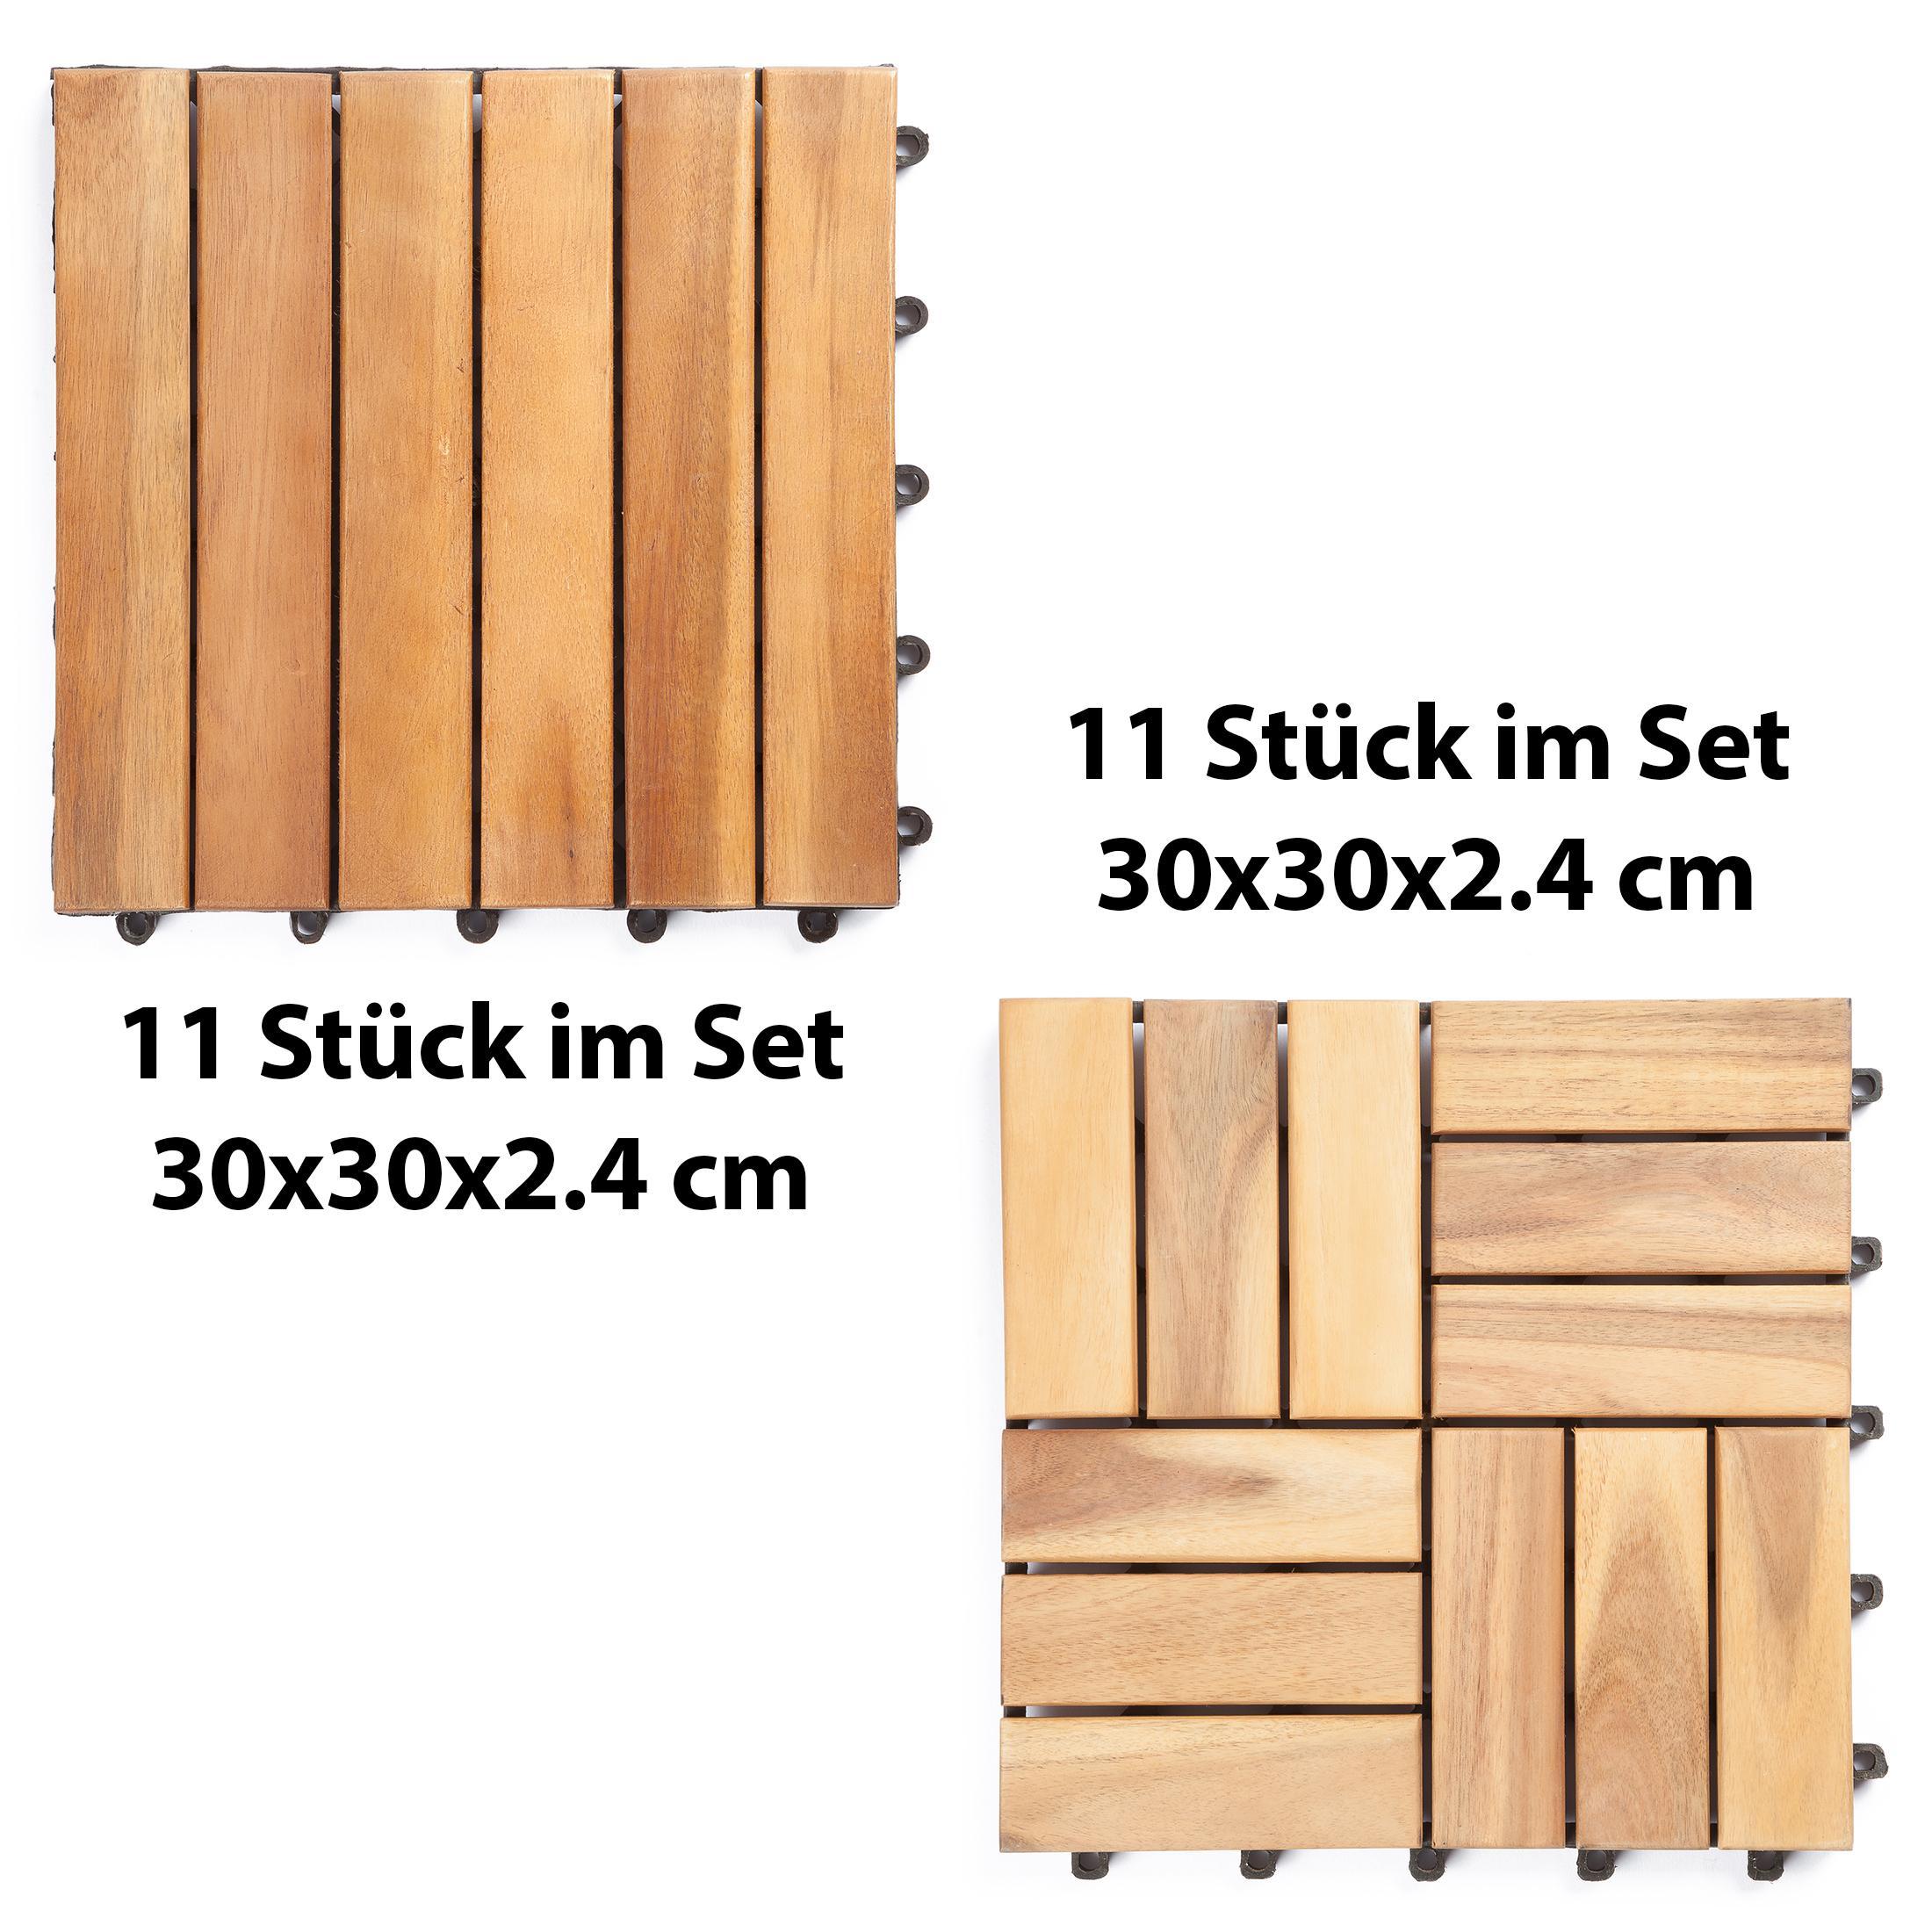 Baldosa de madera instalacion baldosa baldosa de madera - Baldosas de madera ...